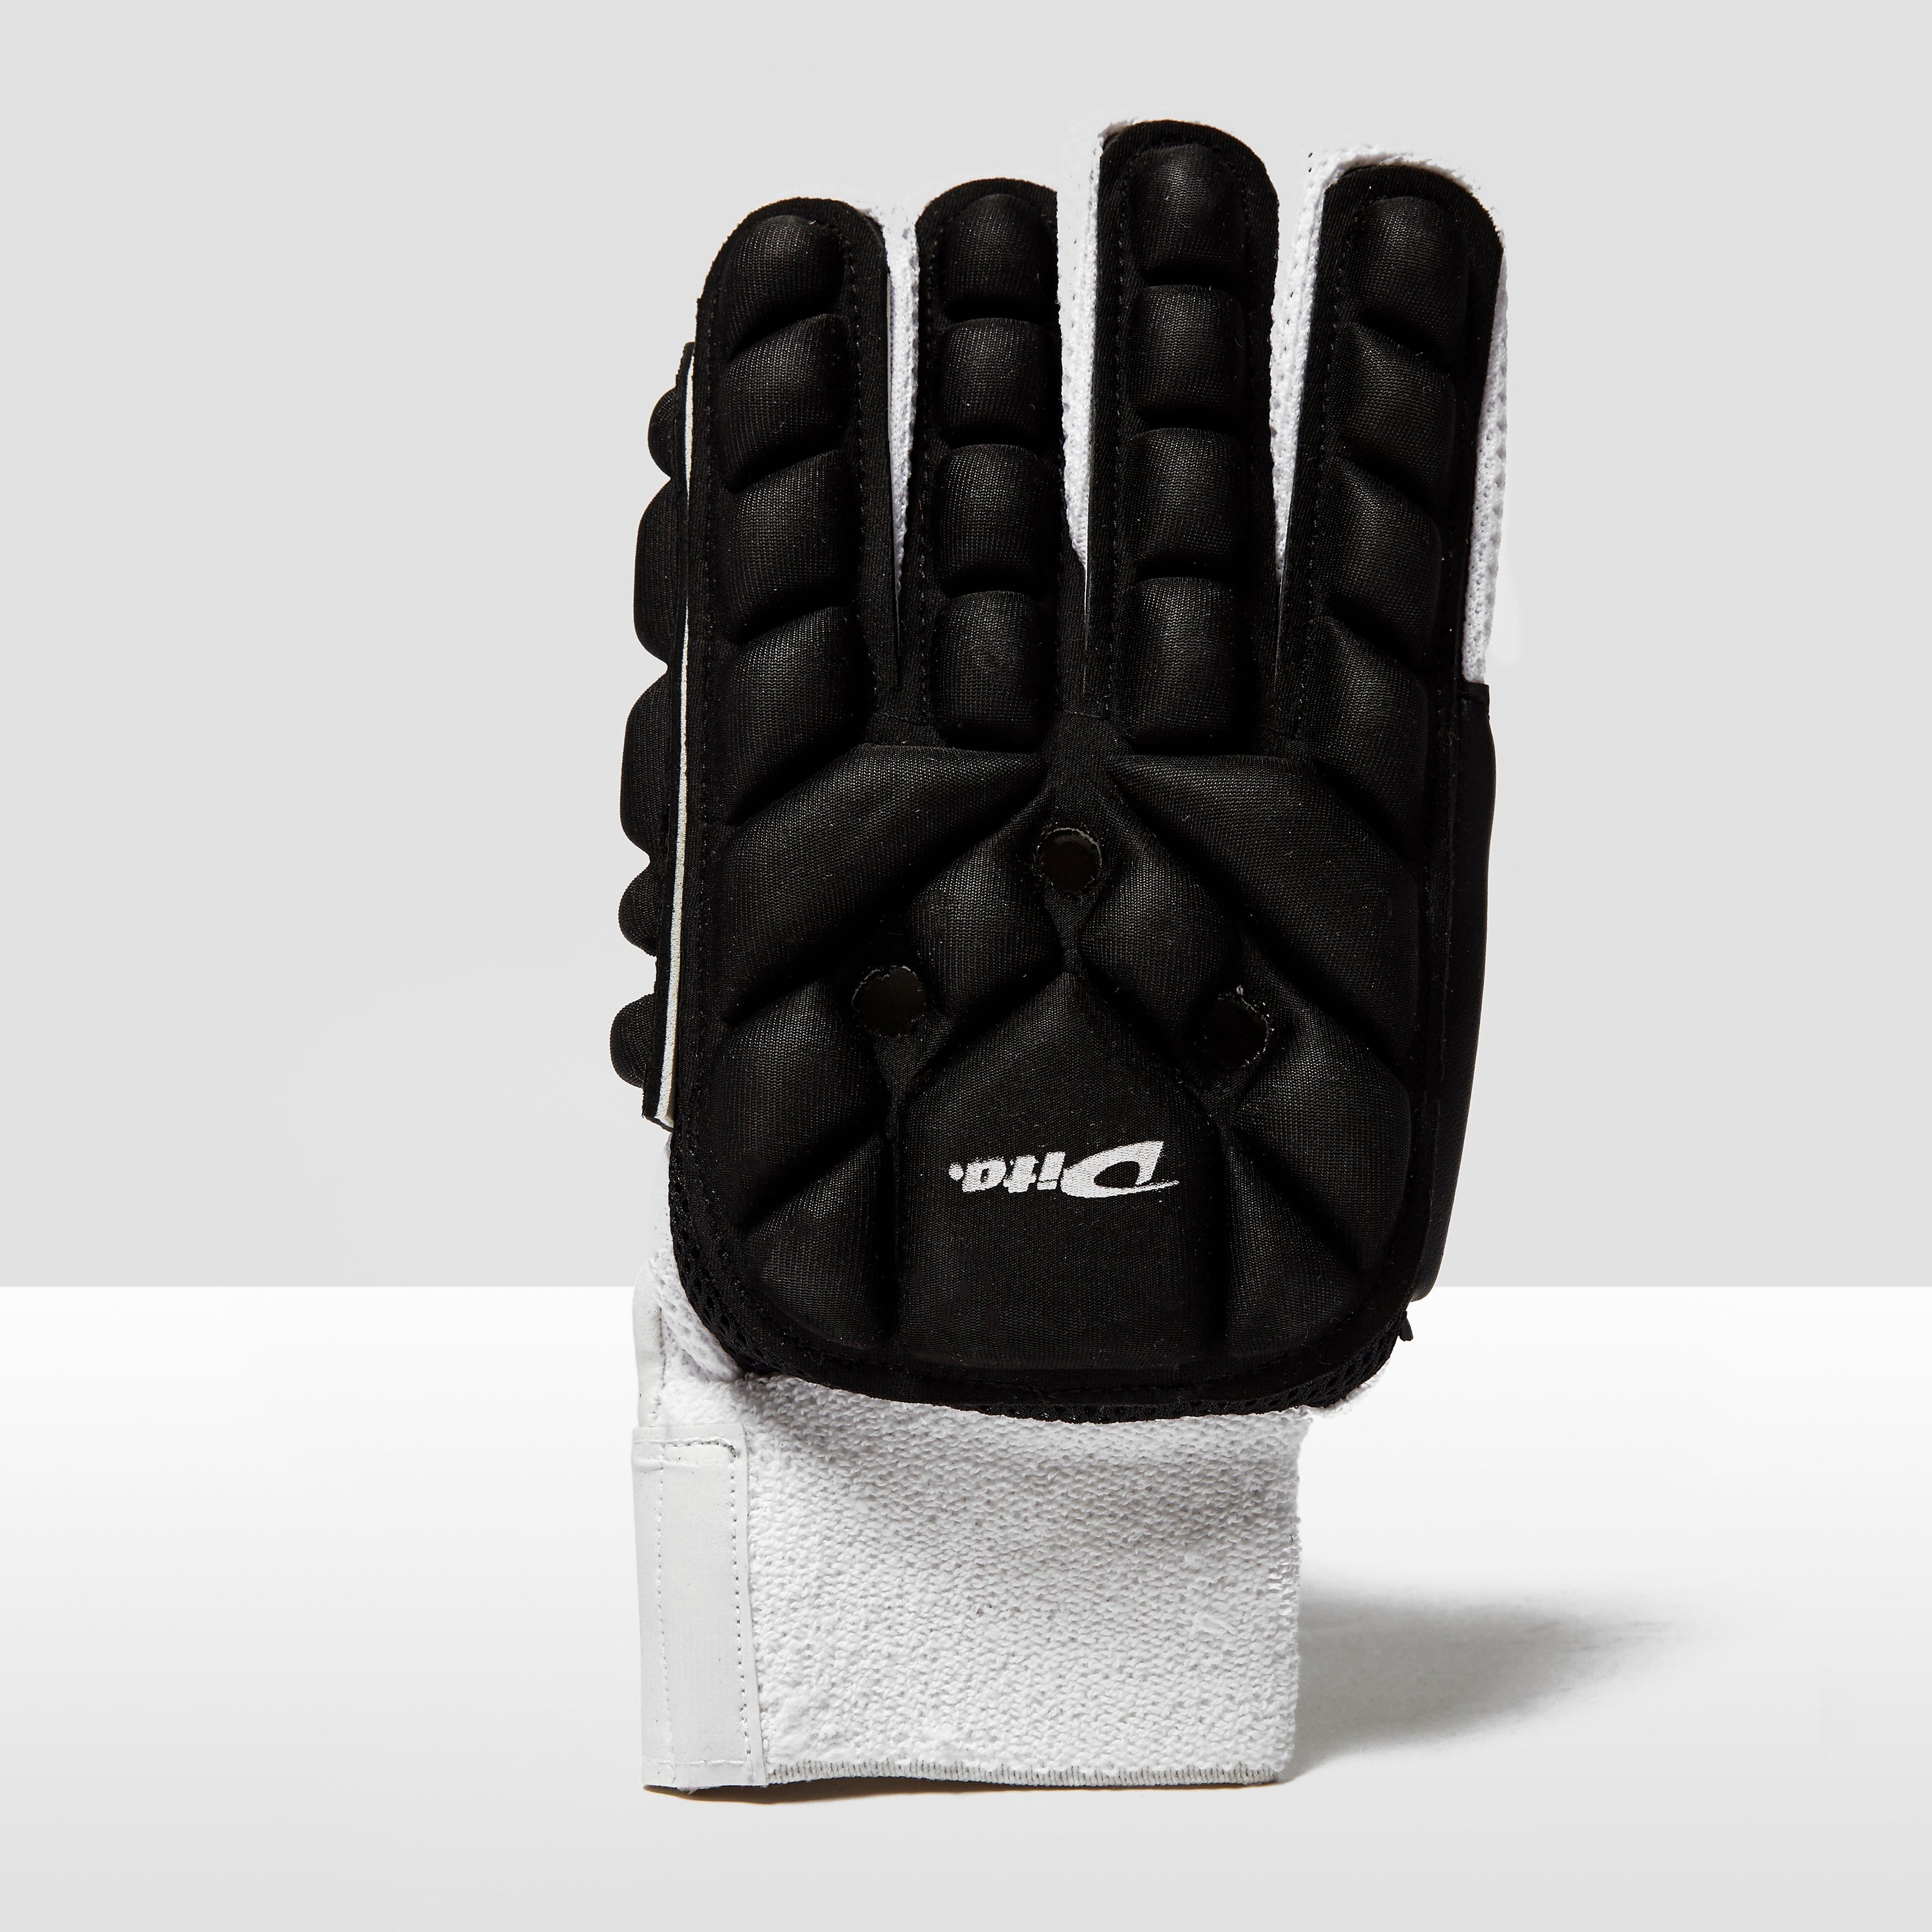 Dita Extreme Pro Full Gloves